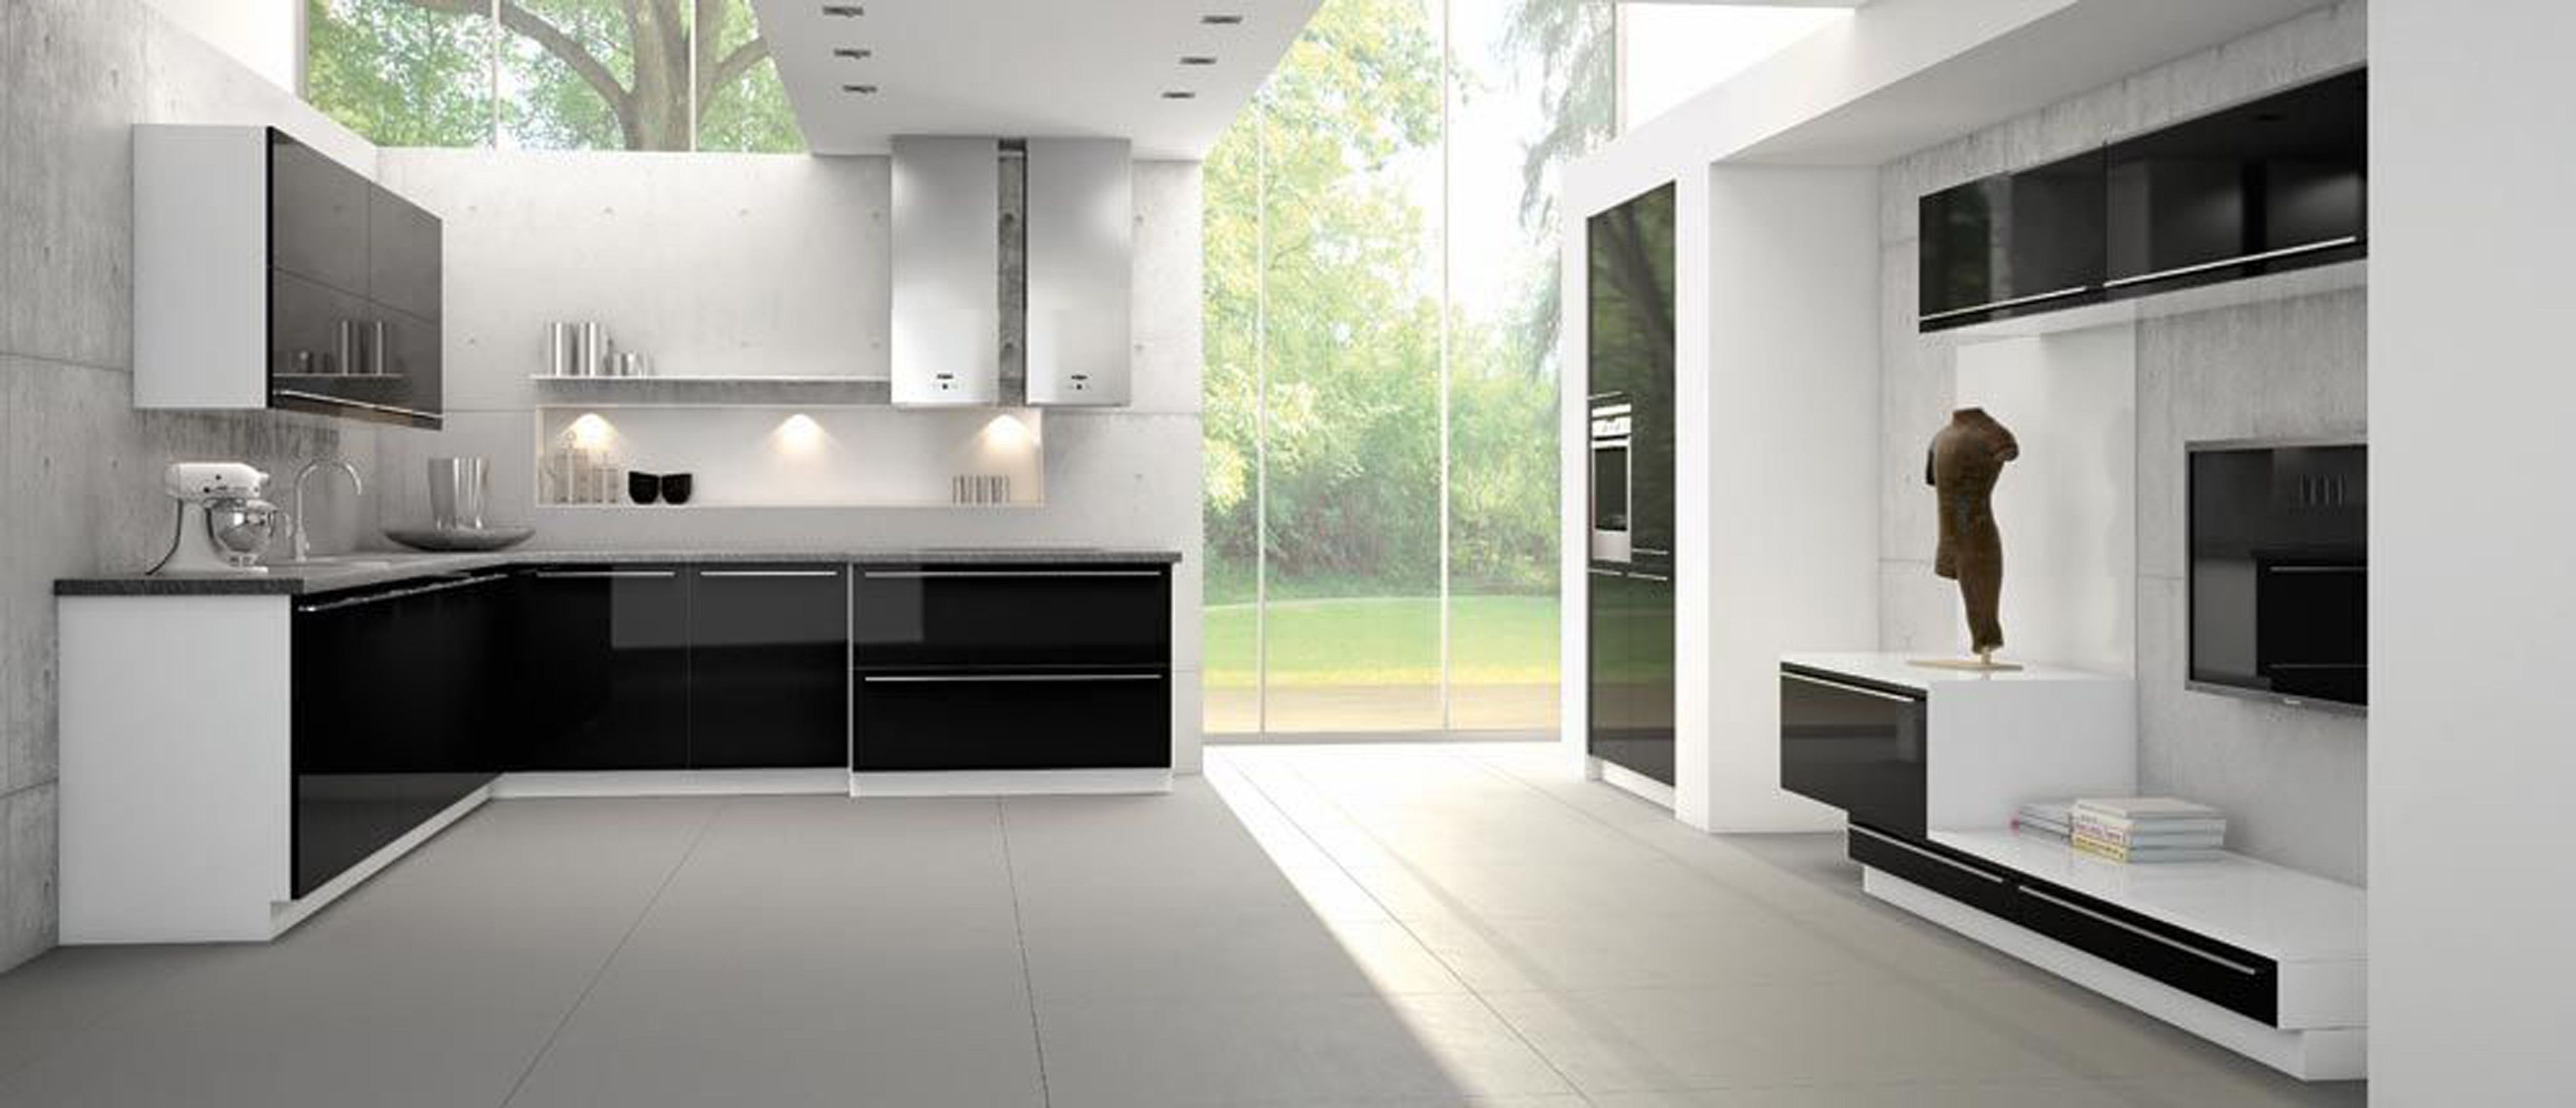 small kitchen island designs ideas plans kitchen backsplash subway tile design ideas kitchen design idea #Kitchen